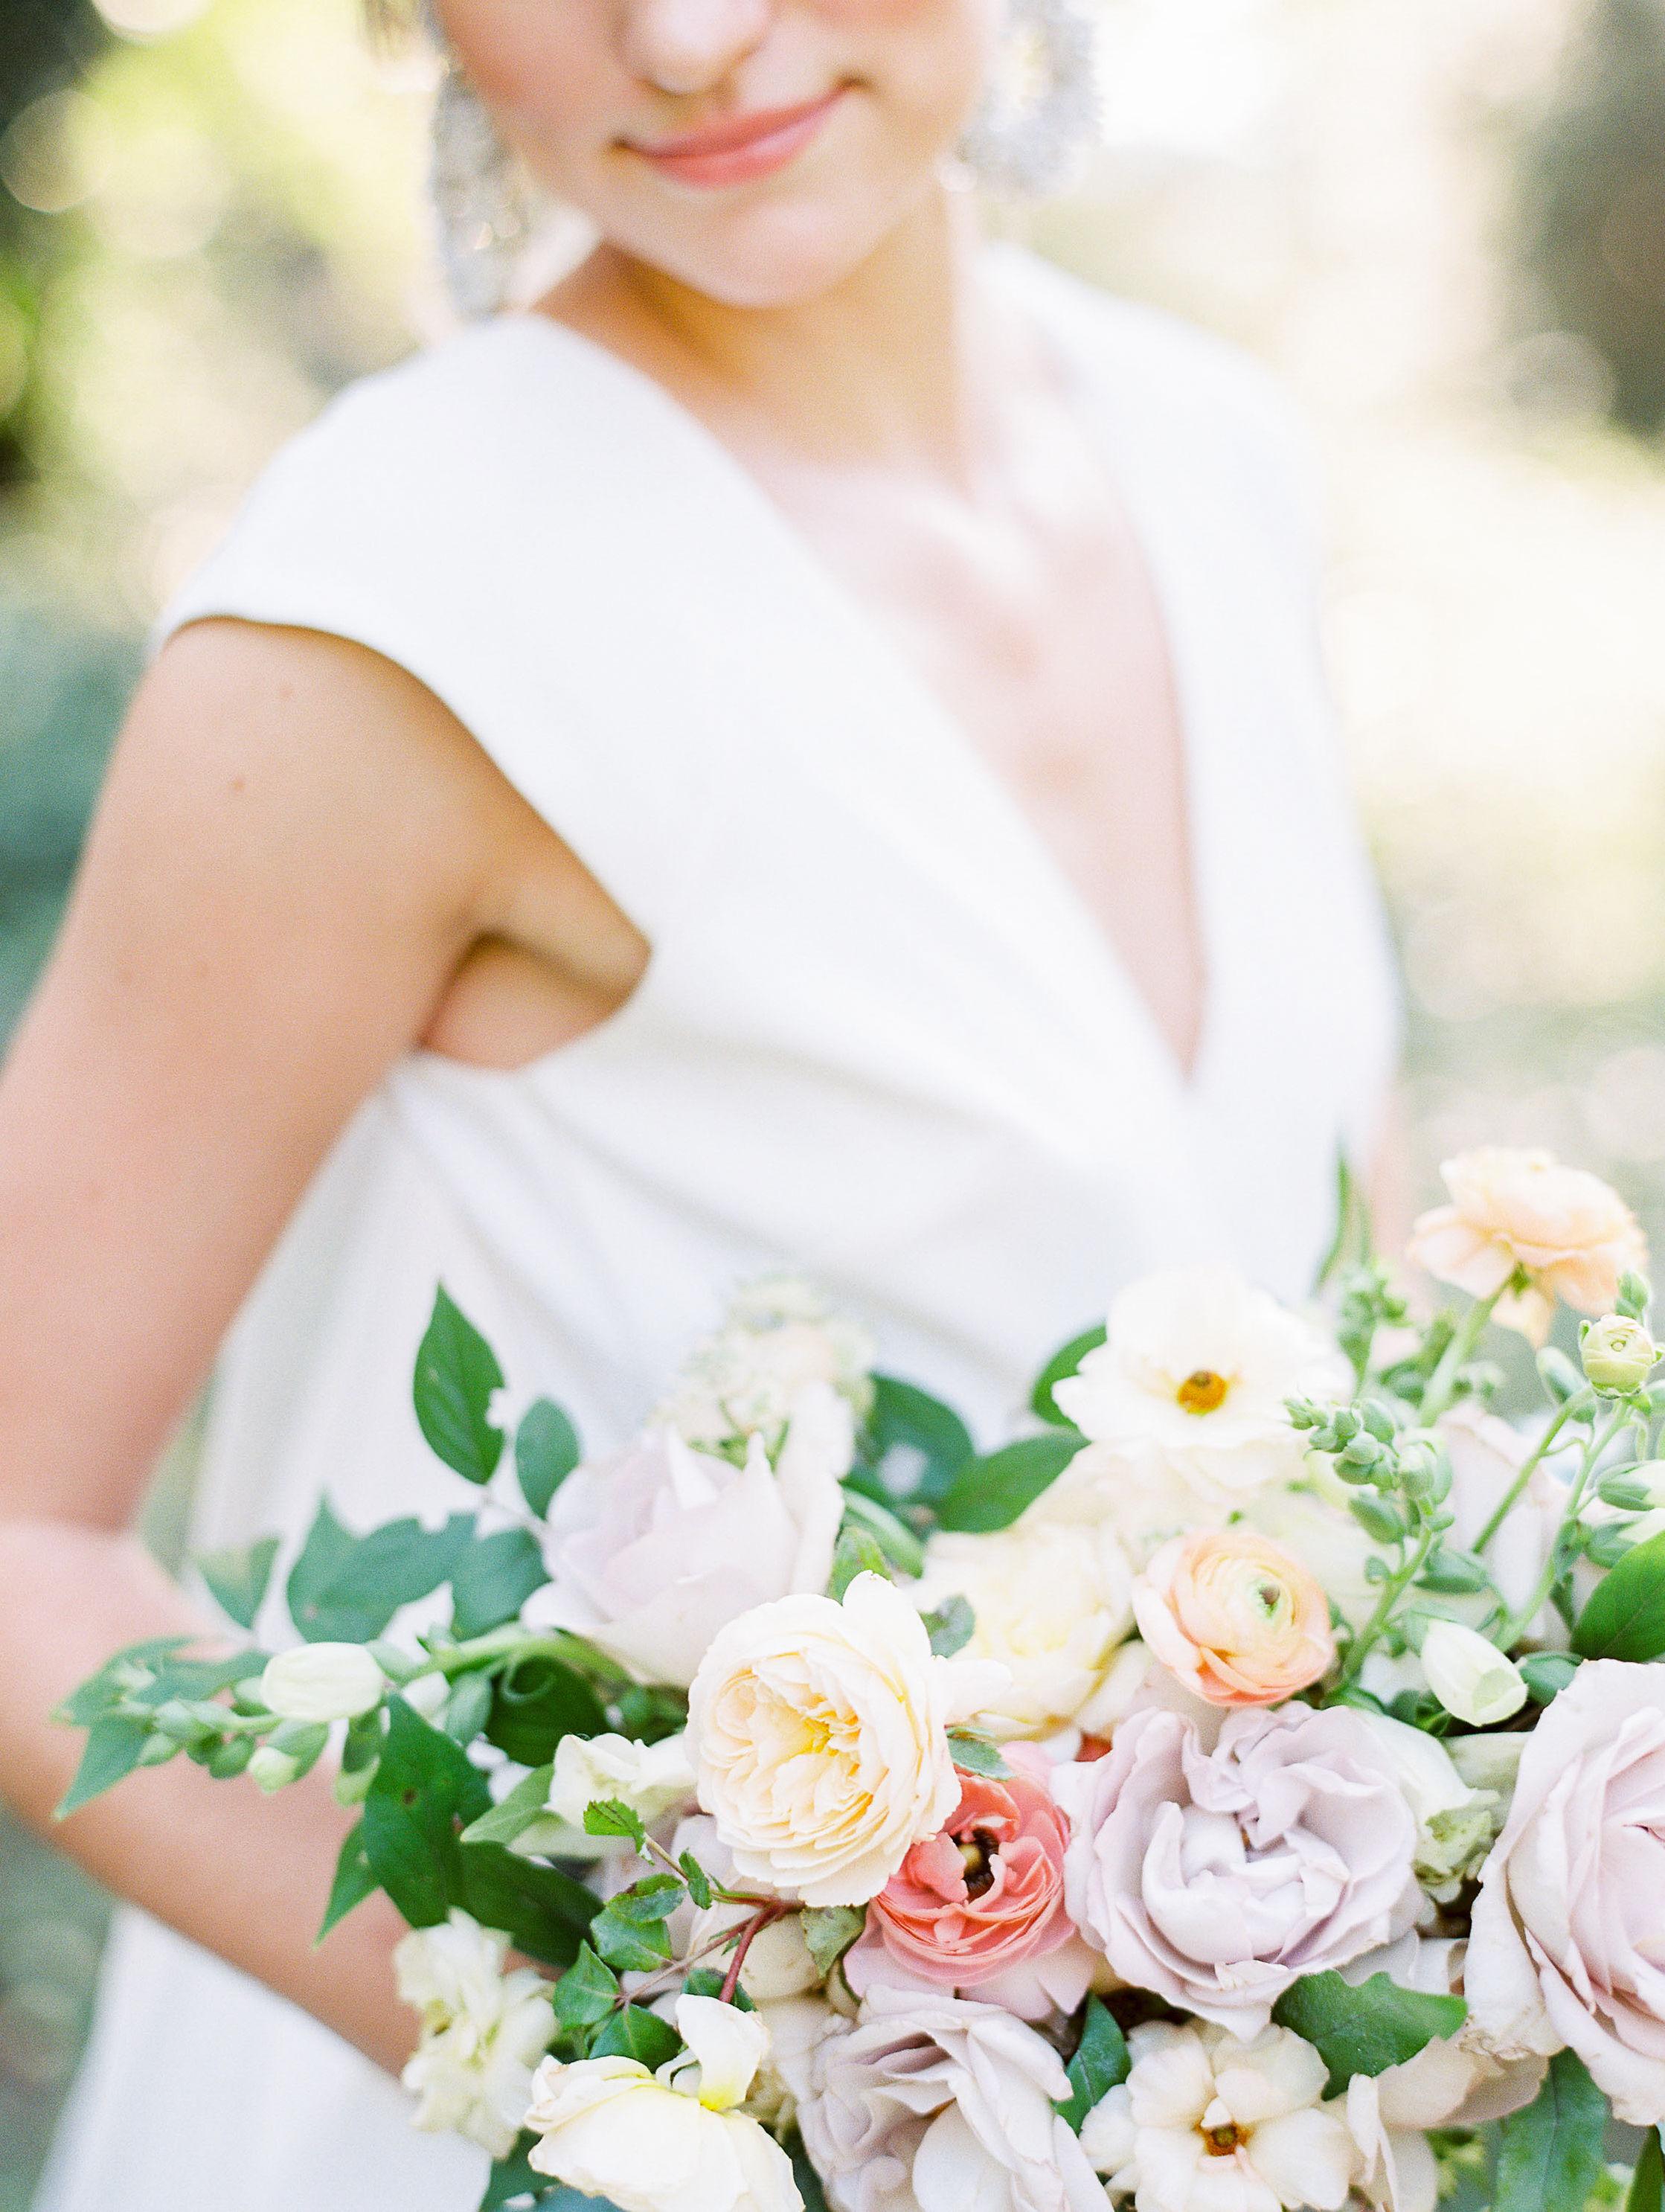 Mary Wynn Amy Osaba Design Floral Weddings Dunaway Gardens Atlanta Southeast